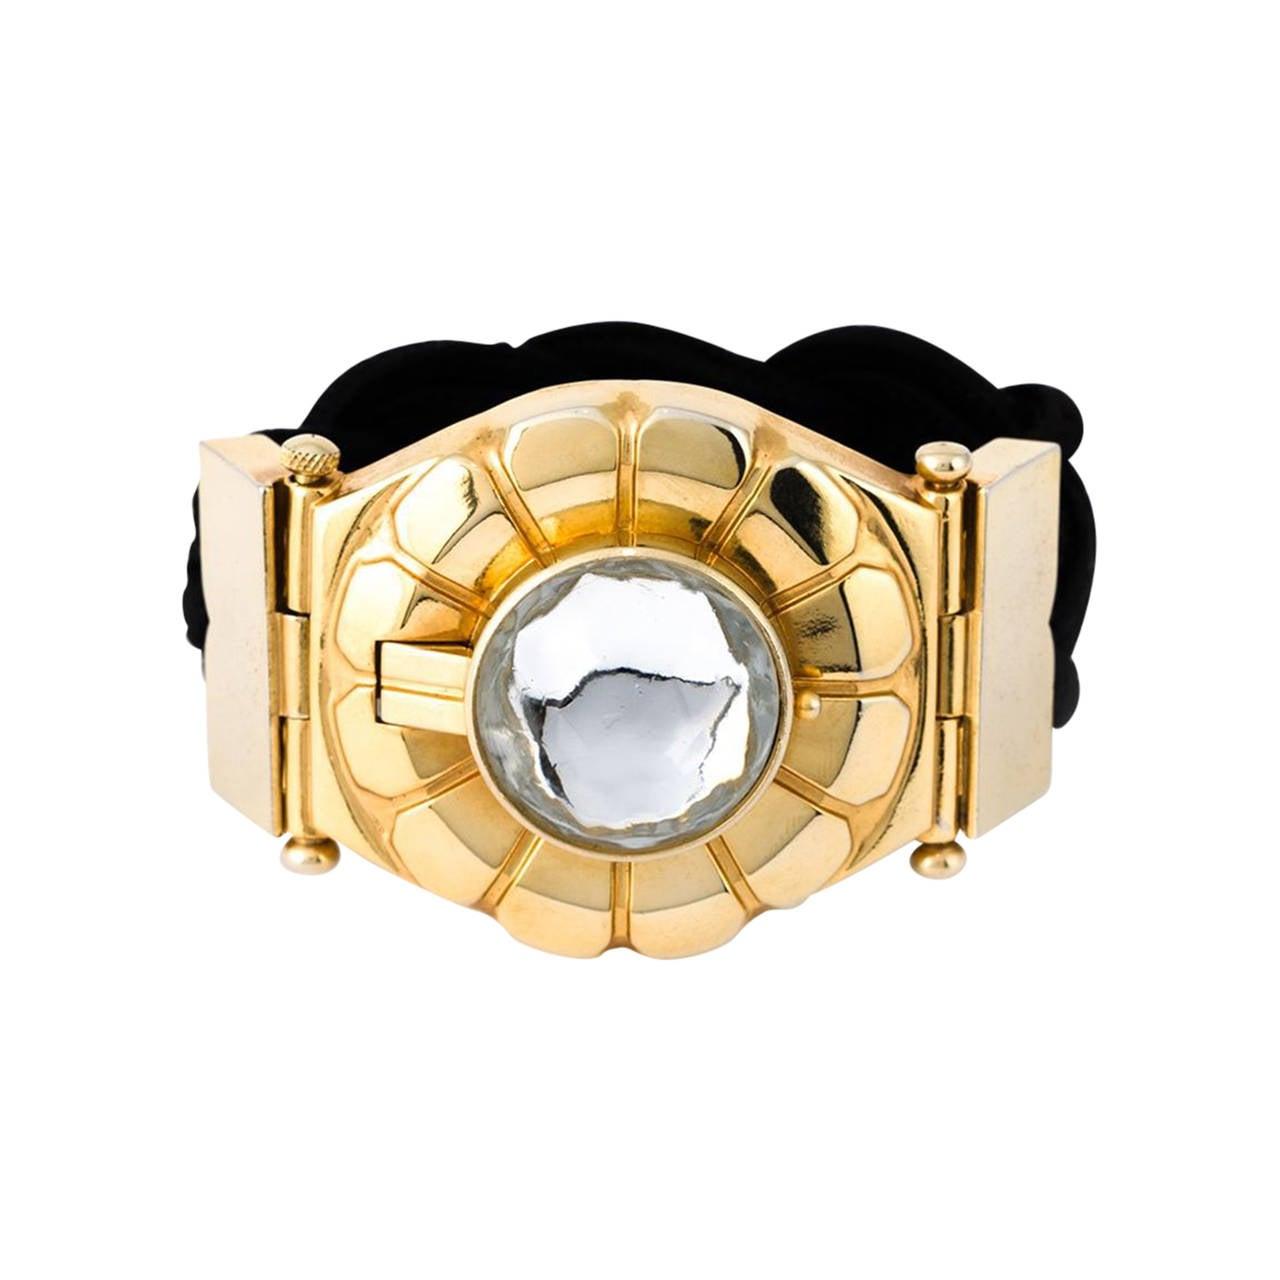 YSL Perfume Bracelet 1980 For Sale